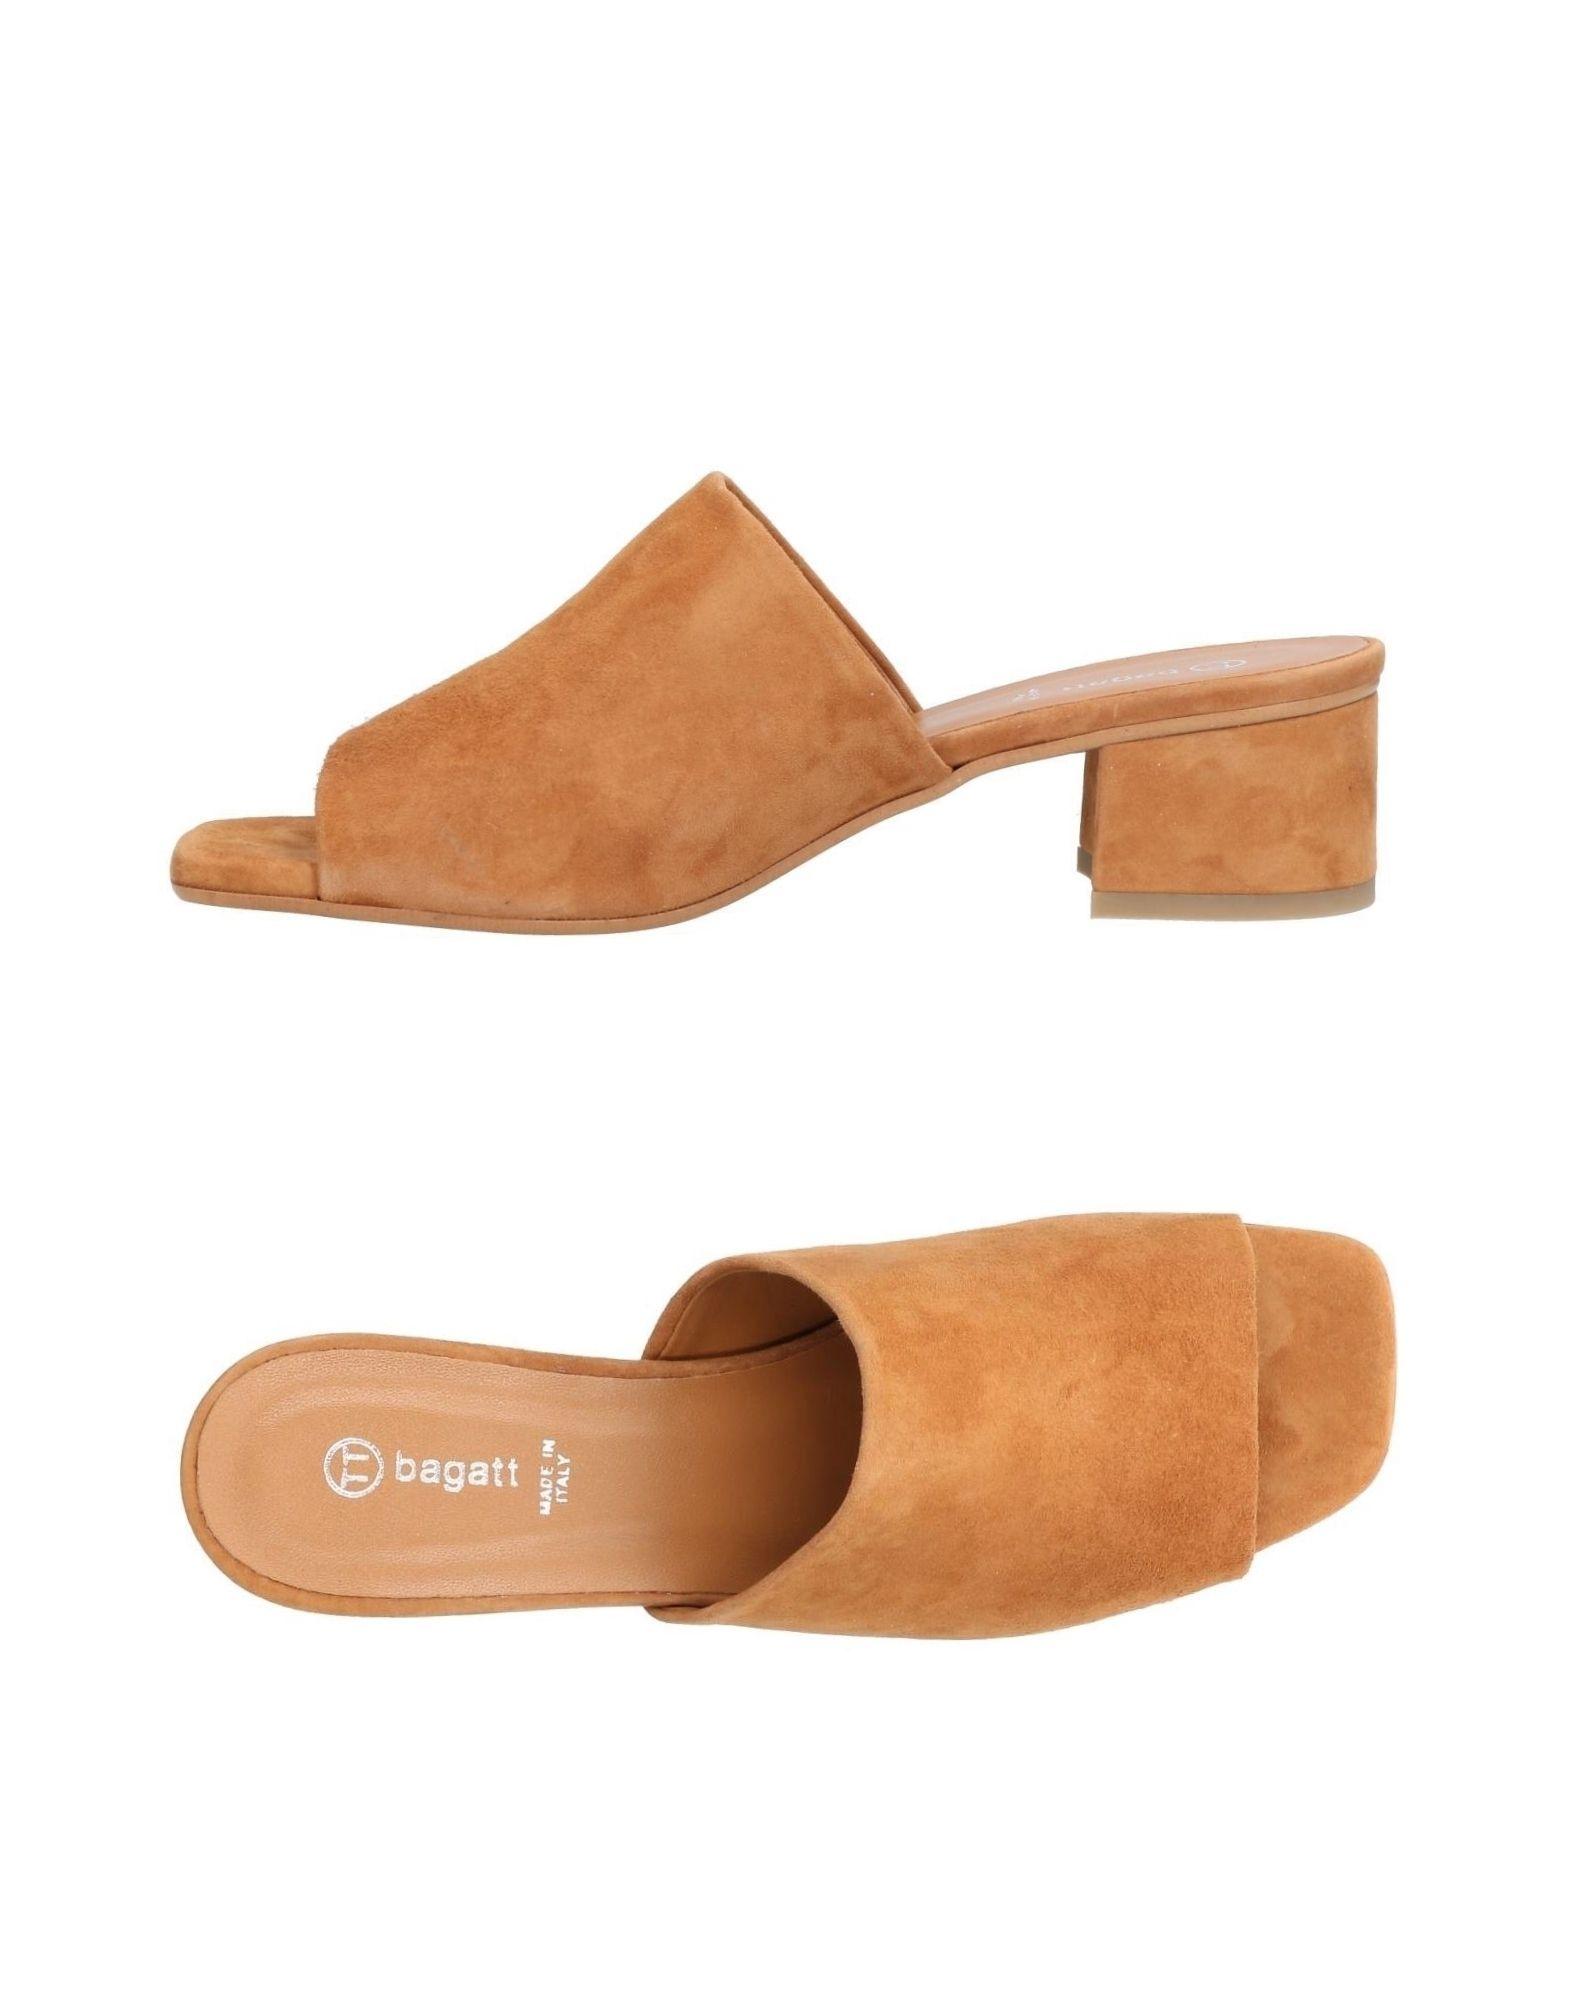 11412722FO Bagatt Sandalen Damen  11412722FO  Heiße Schuhe 05d2be